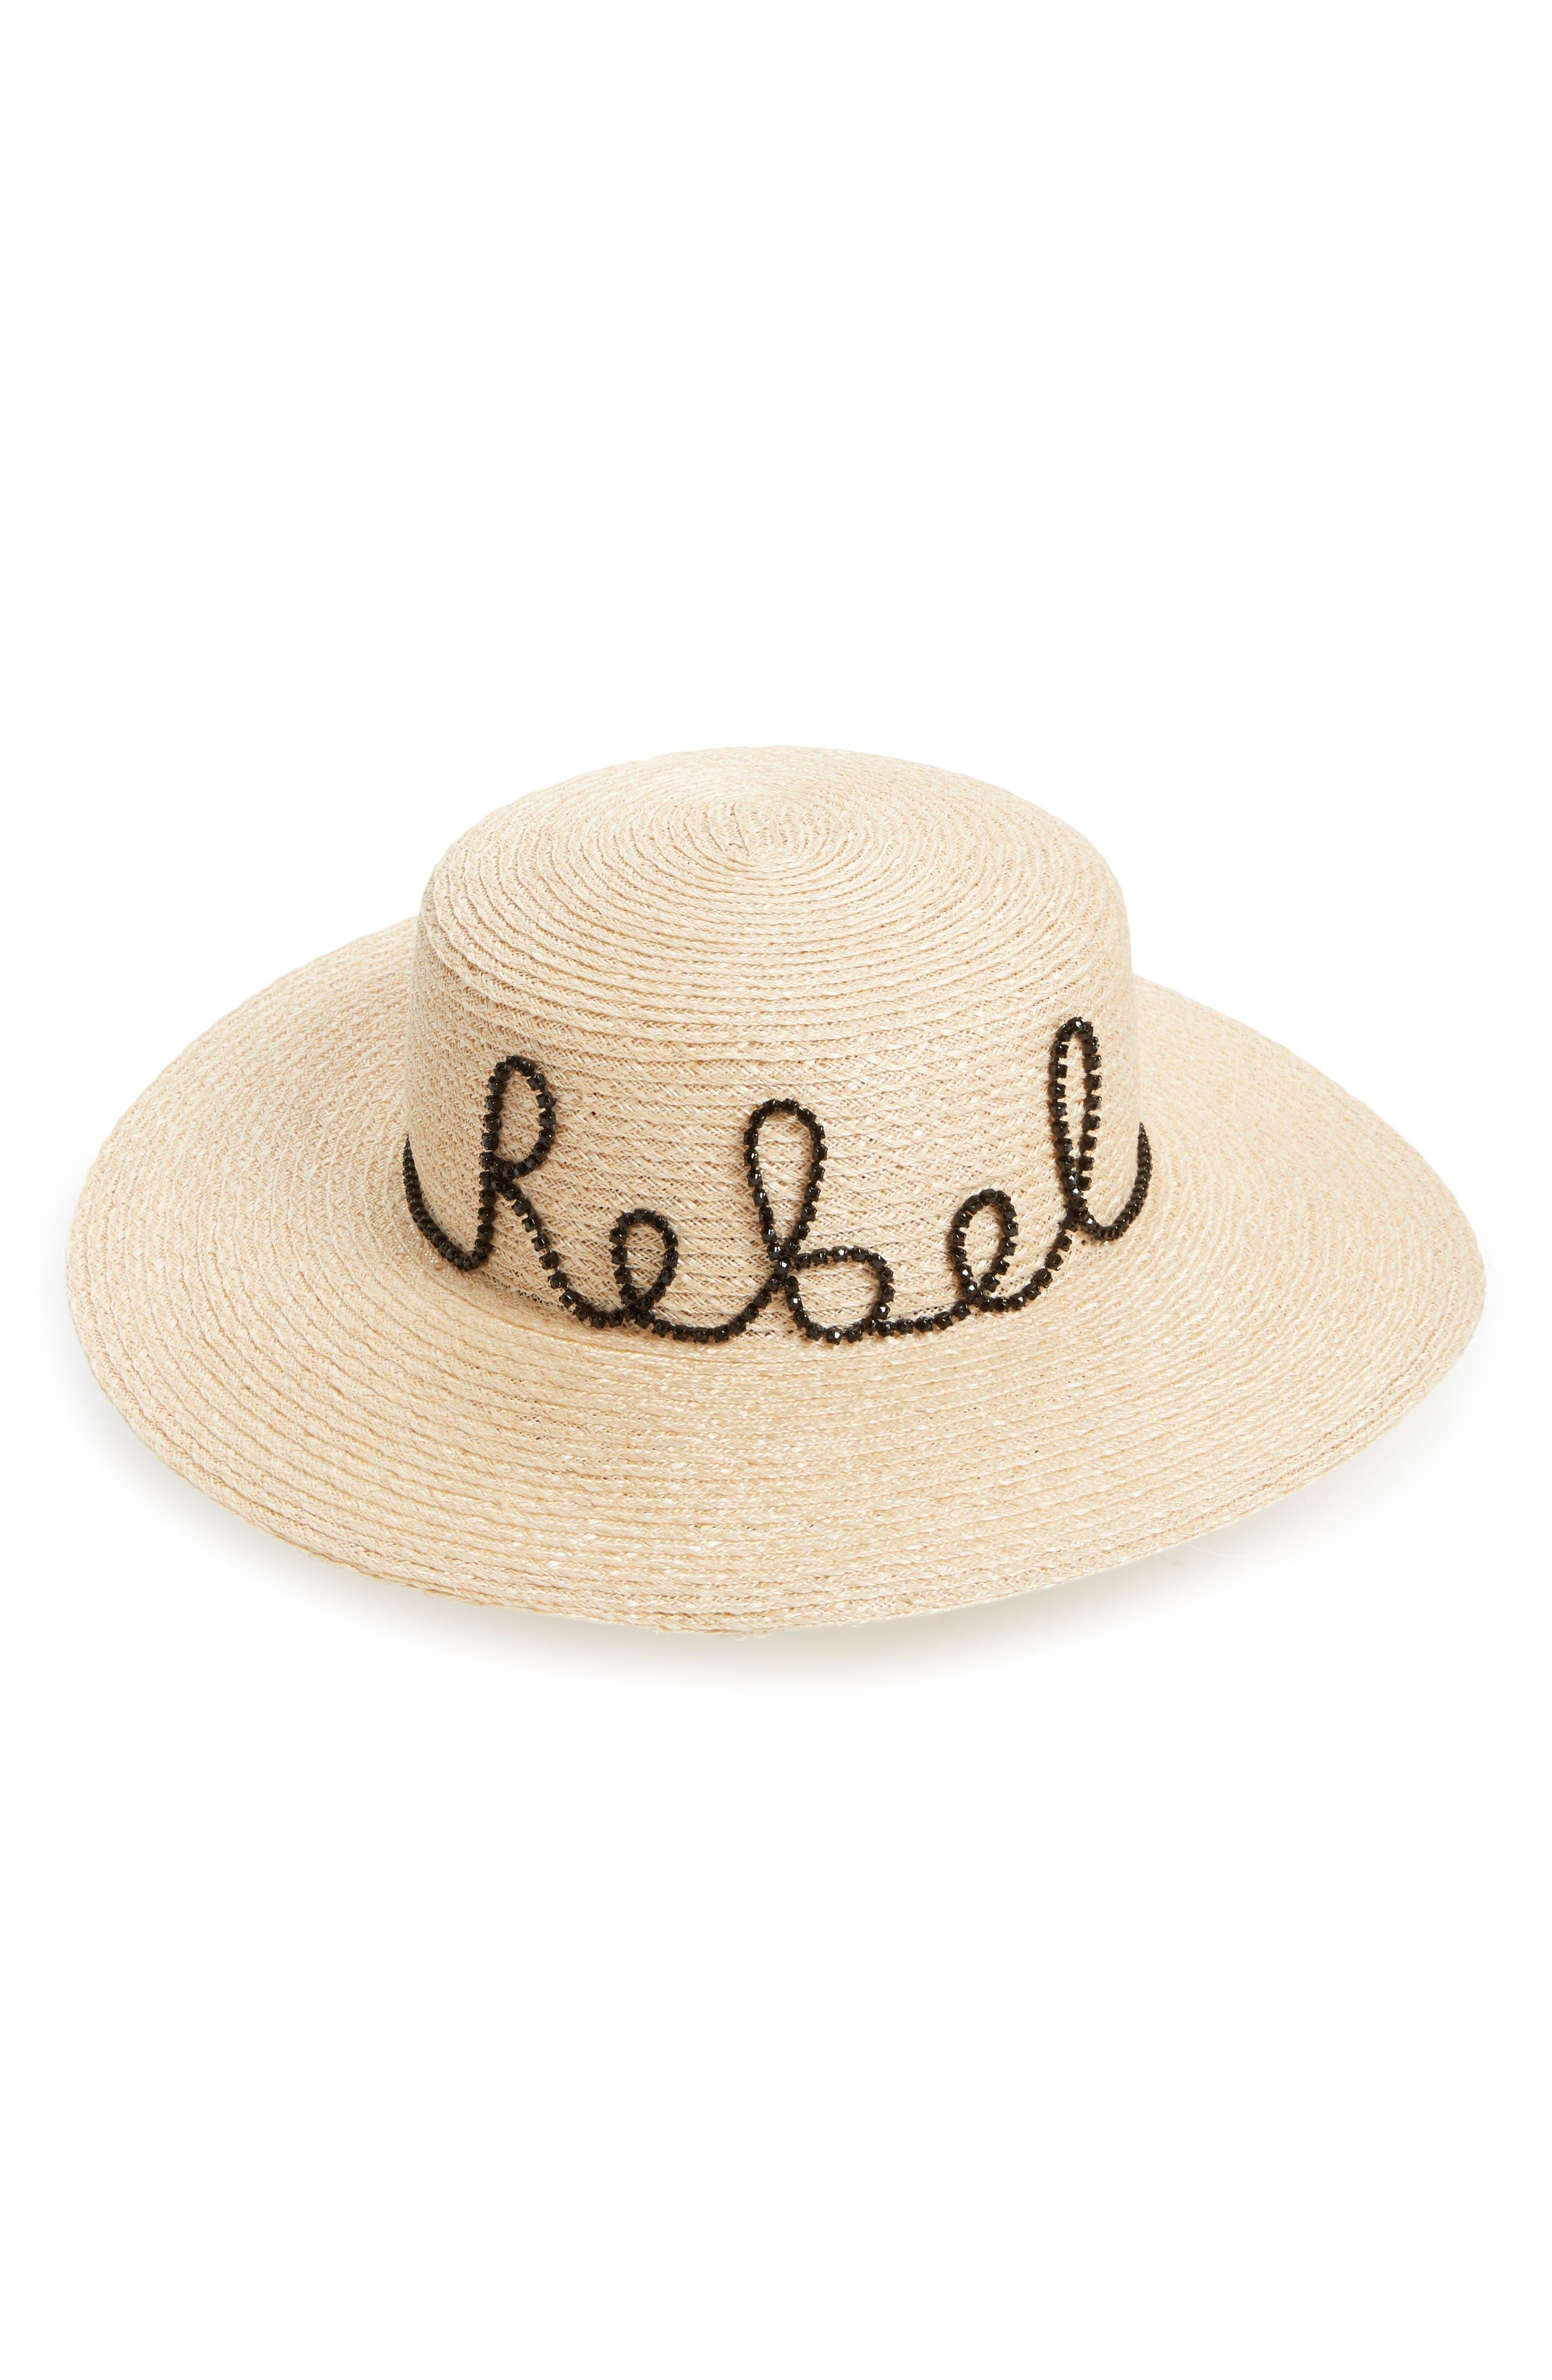 Alternate Image 1 Selected - Eugenia Kim Colette Rebel Boater Hat